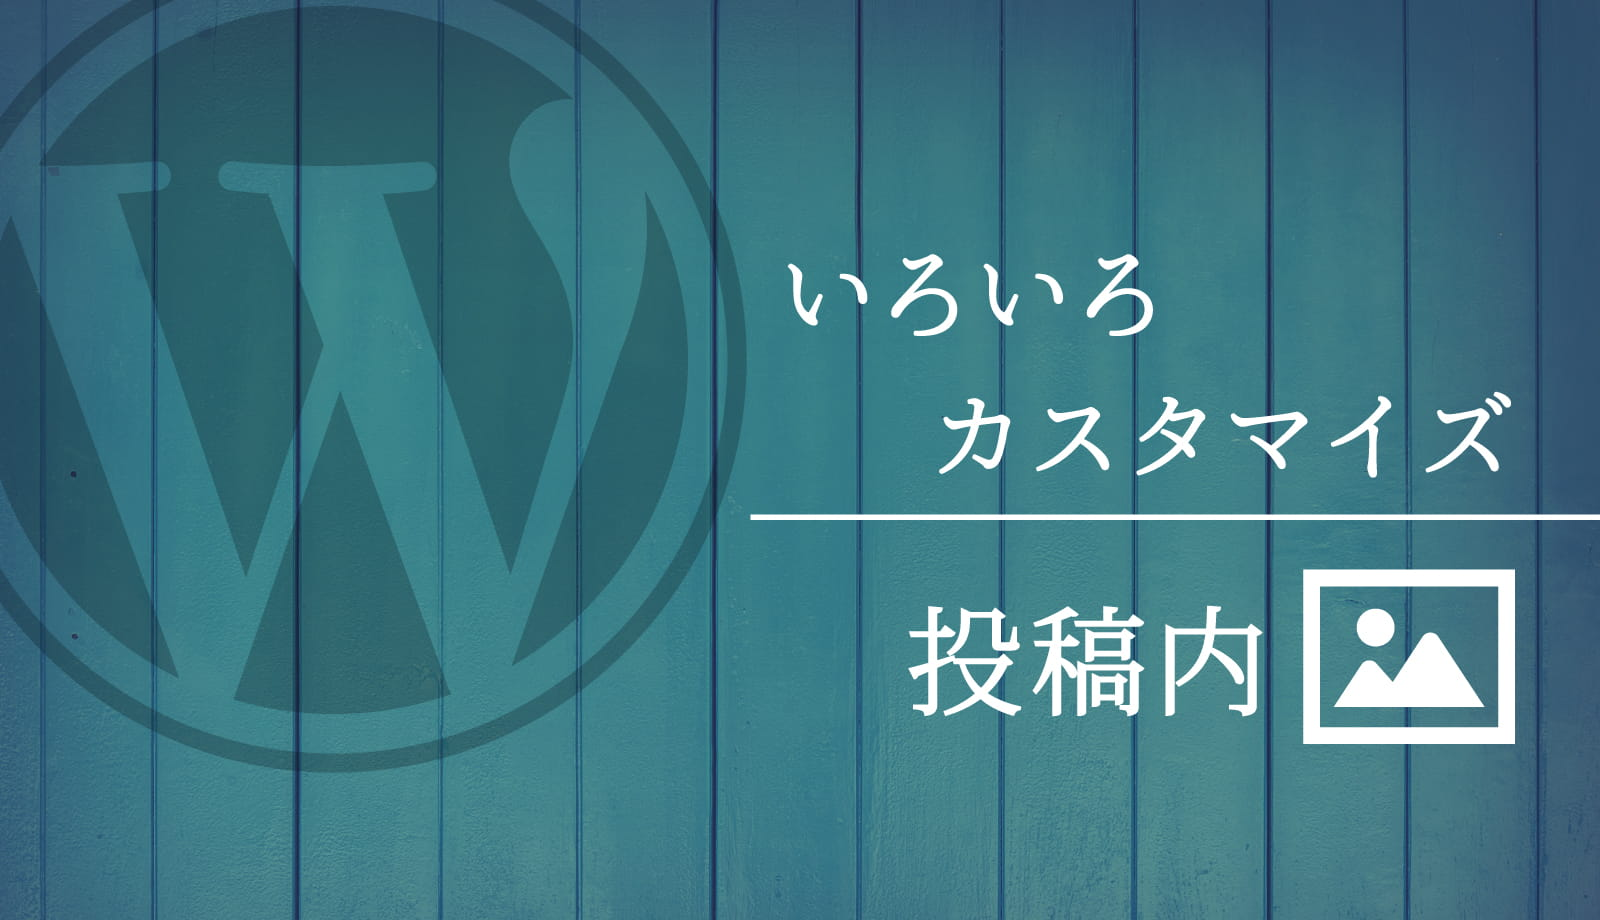 [WordPress] 投稿内で画像のalt属性が空だったら任意の文字列で埋める方法およびsrcset,widthなど不要な属性値を削除する方法